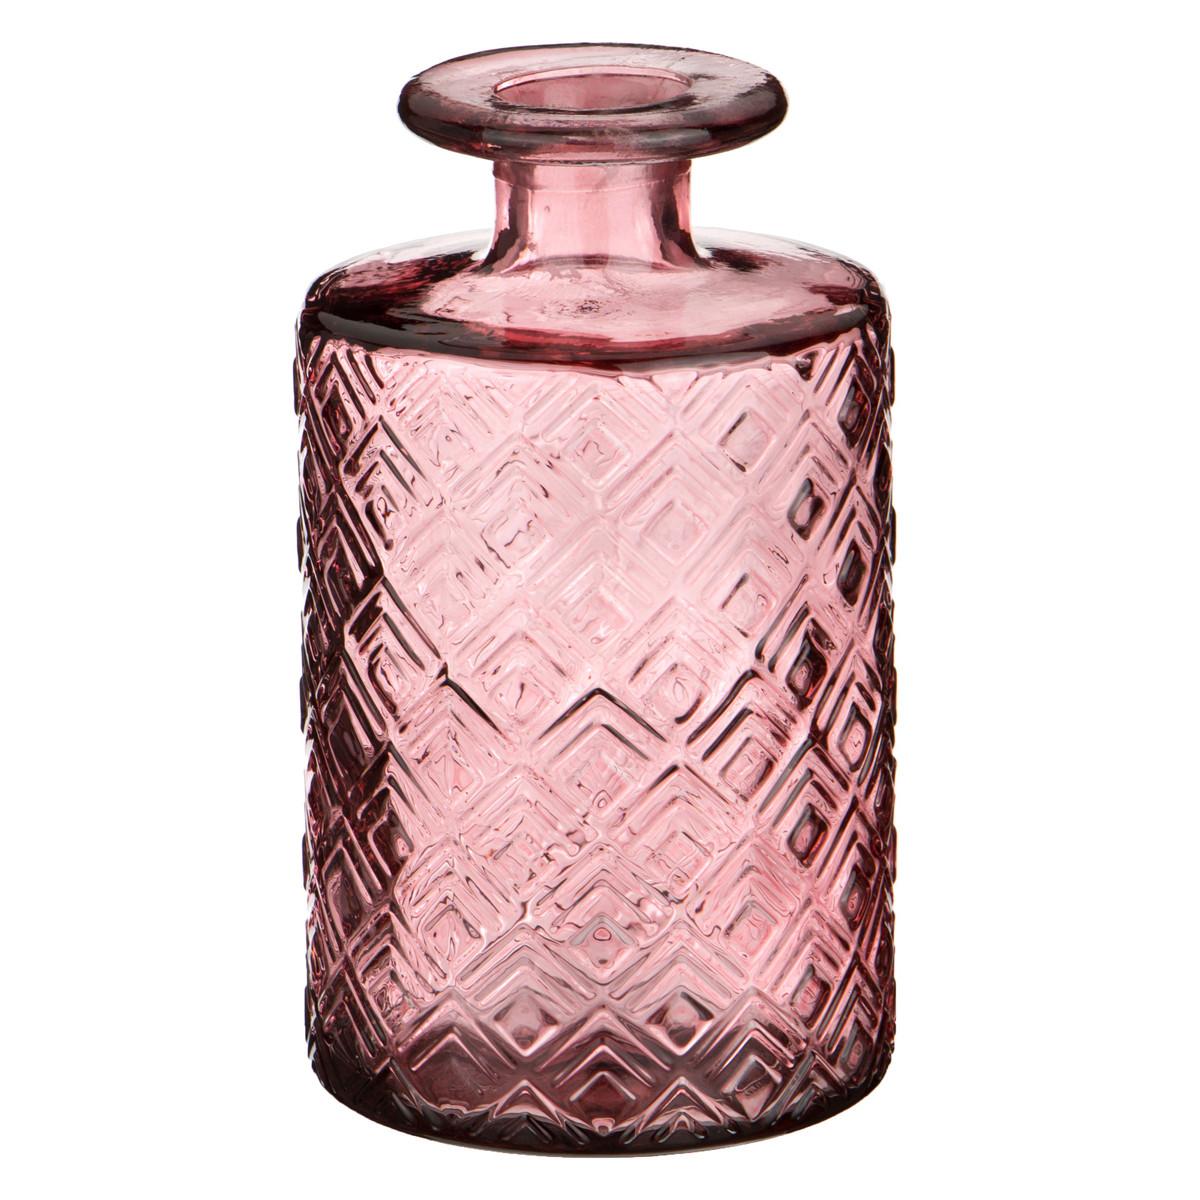 {} San Miguel Ваза интерьерная Delaney  (16 см) san miguel ваза hortense 16 см